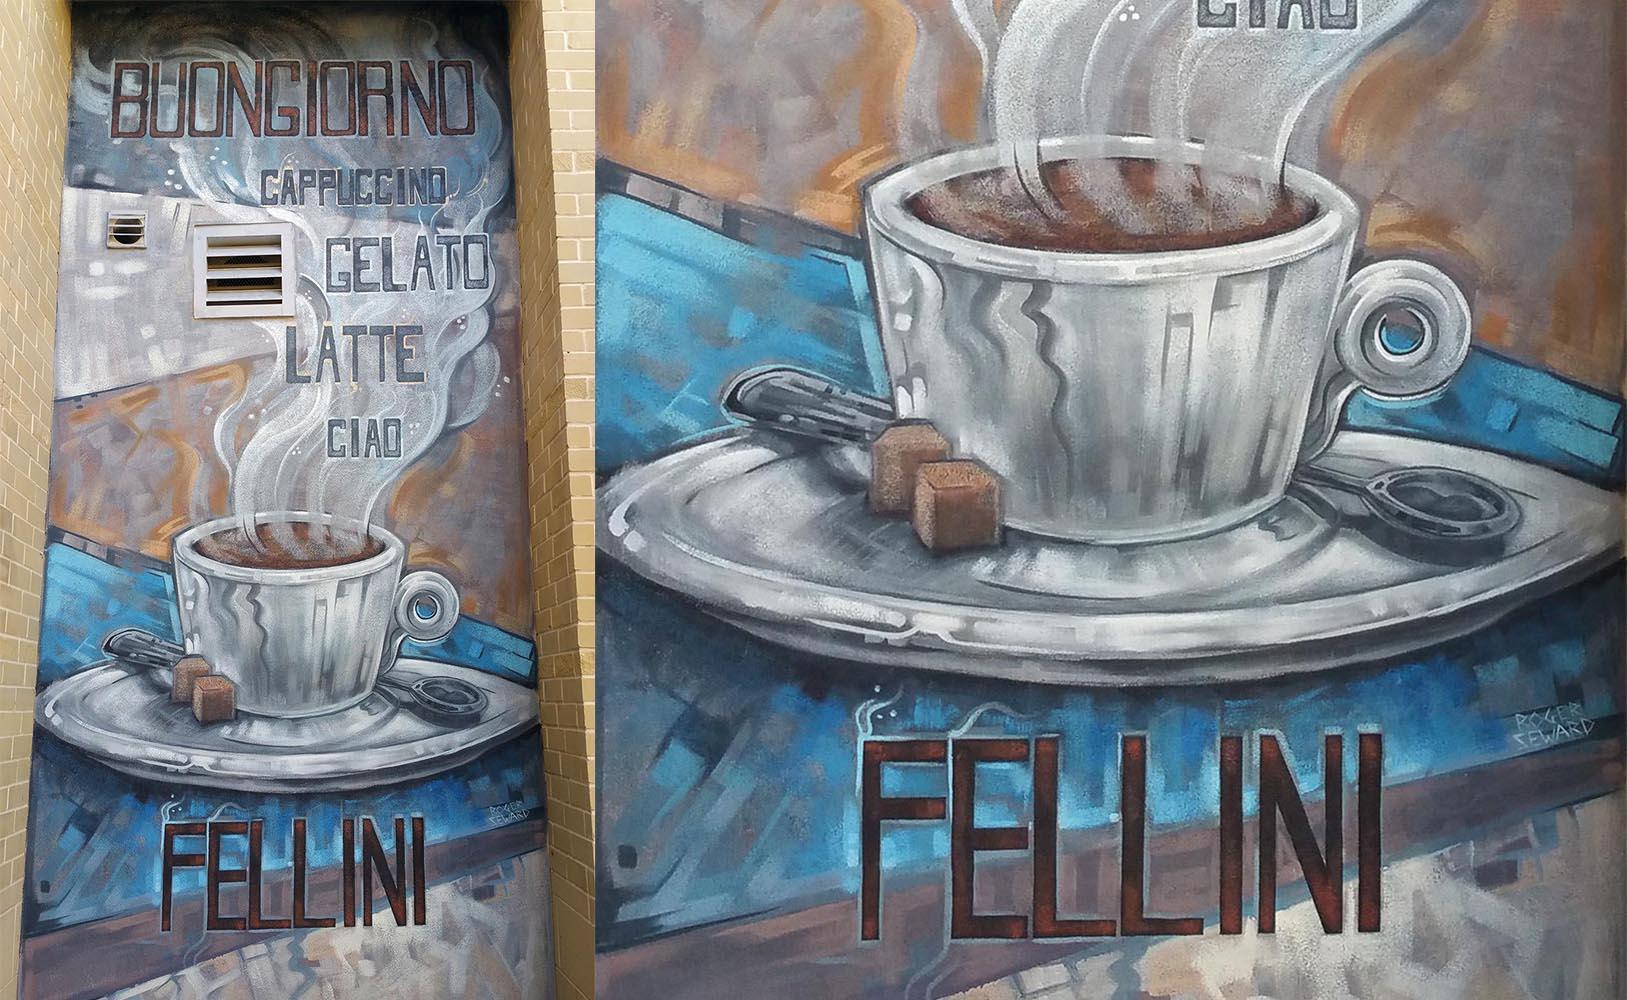 fellini mural g.jpg